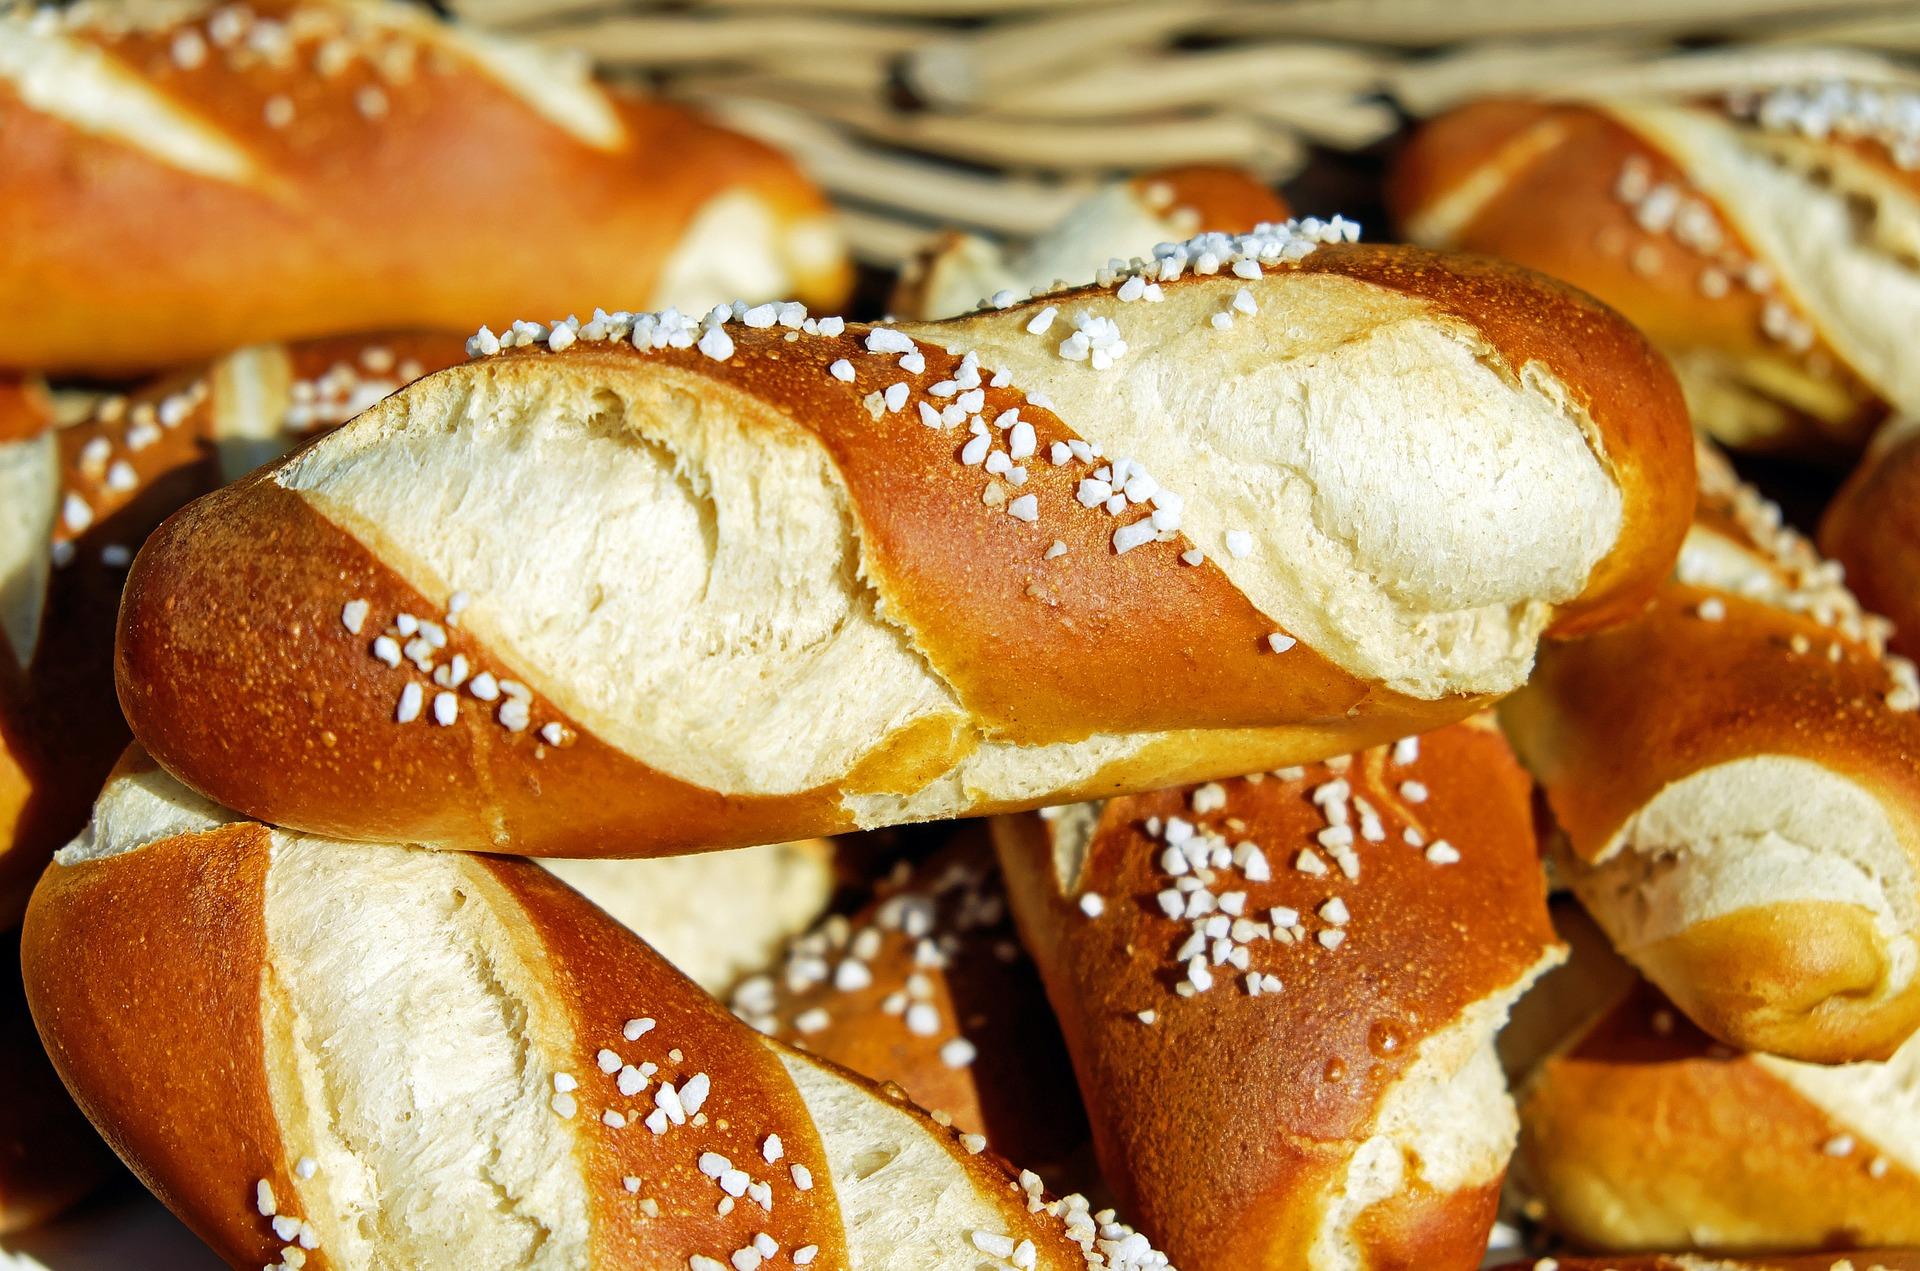 Pixabay - bread